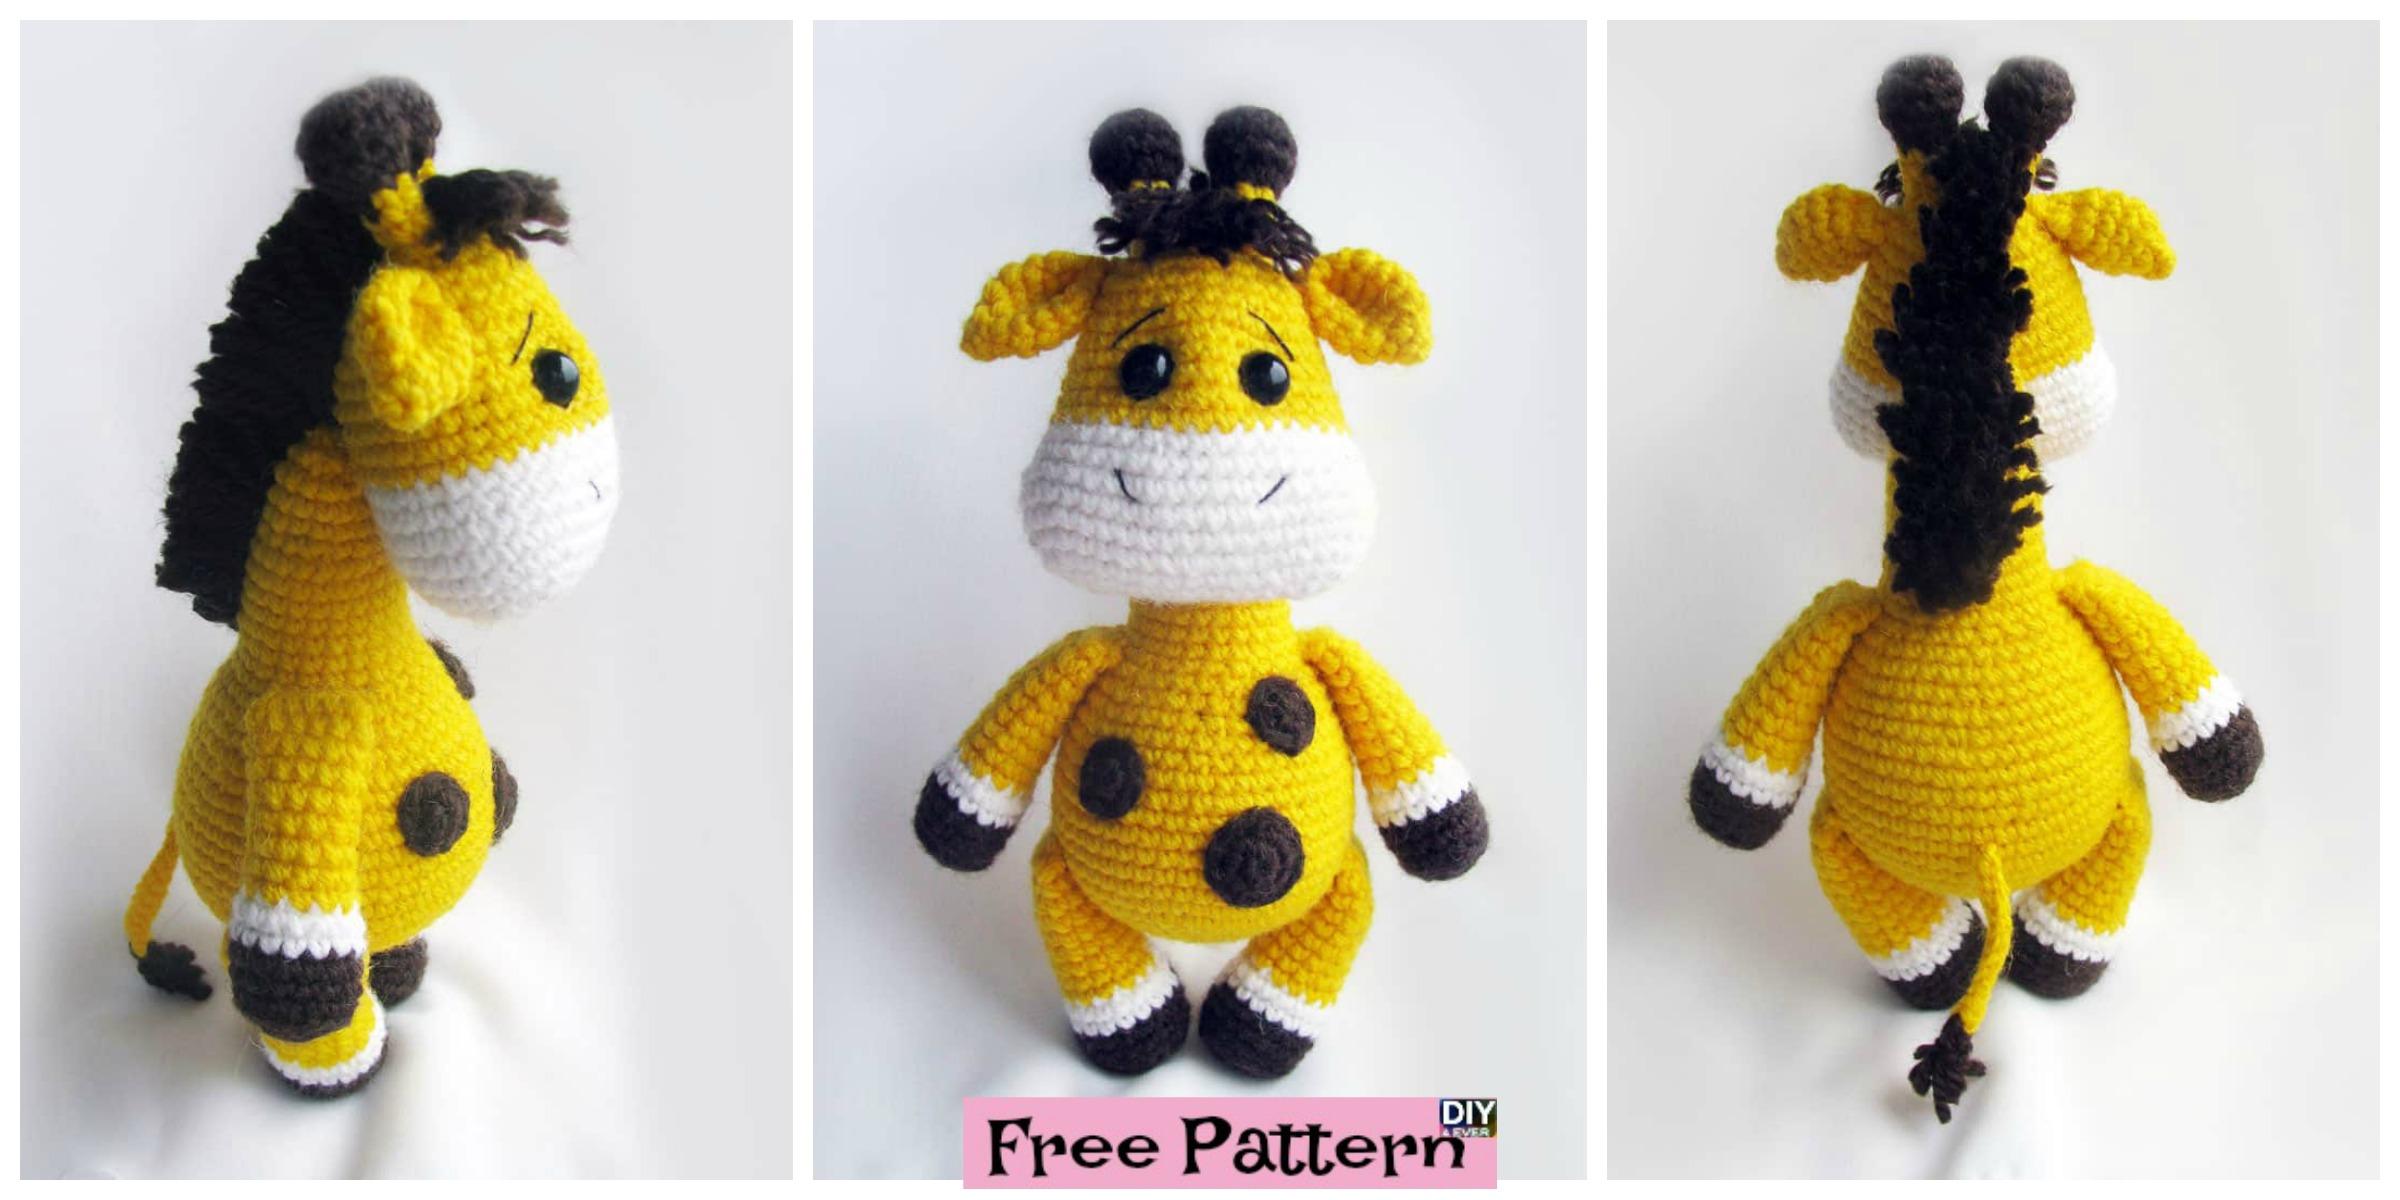 Crochet Baby Giraffe Amigurumi – Free Pattern - 32 Free Crochet ... | 1200x2400